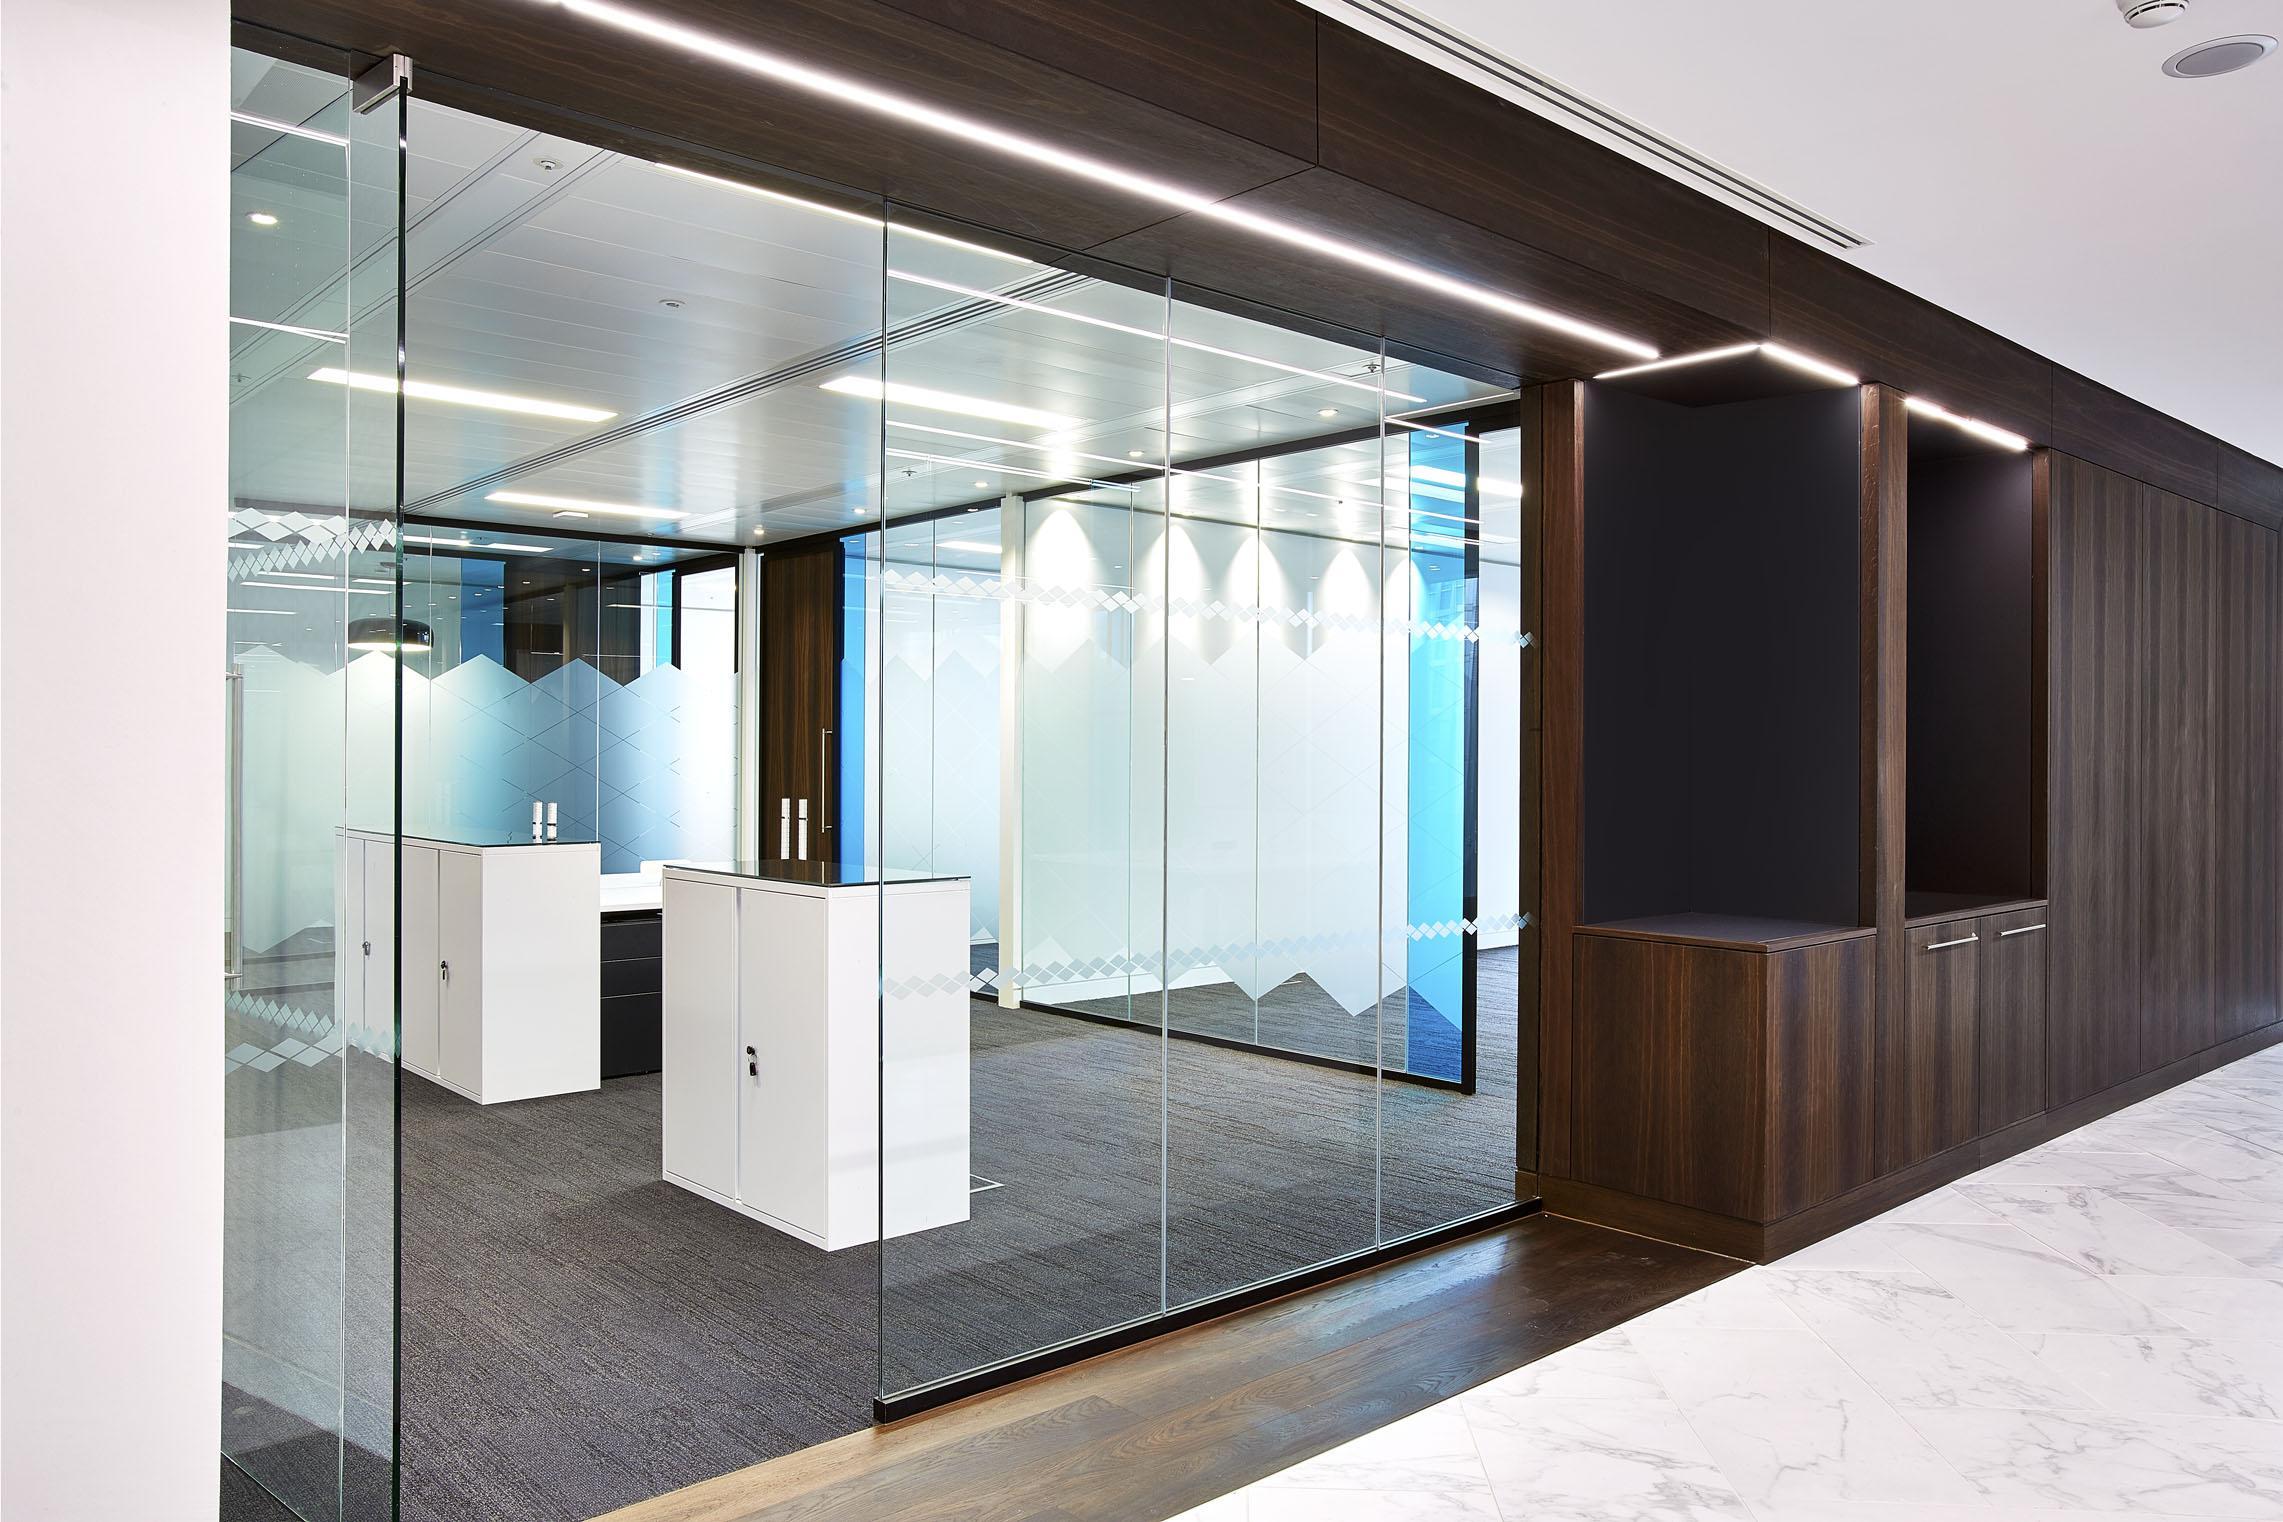 MODERN LIGHTING DESIGN FOR SOPHISTICATED WORKPLACE. - BAYERNLB, LONDON.